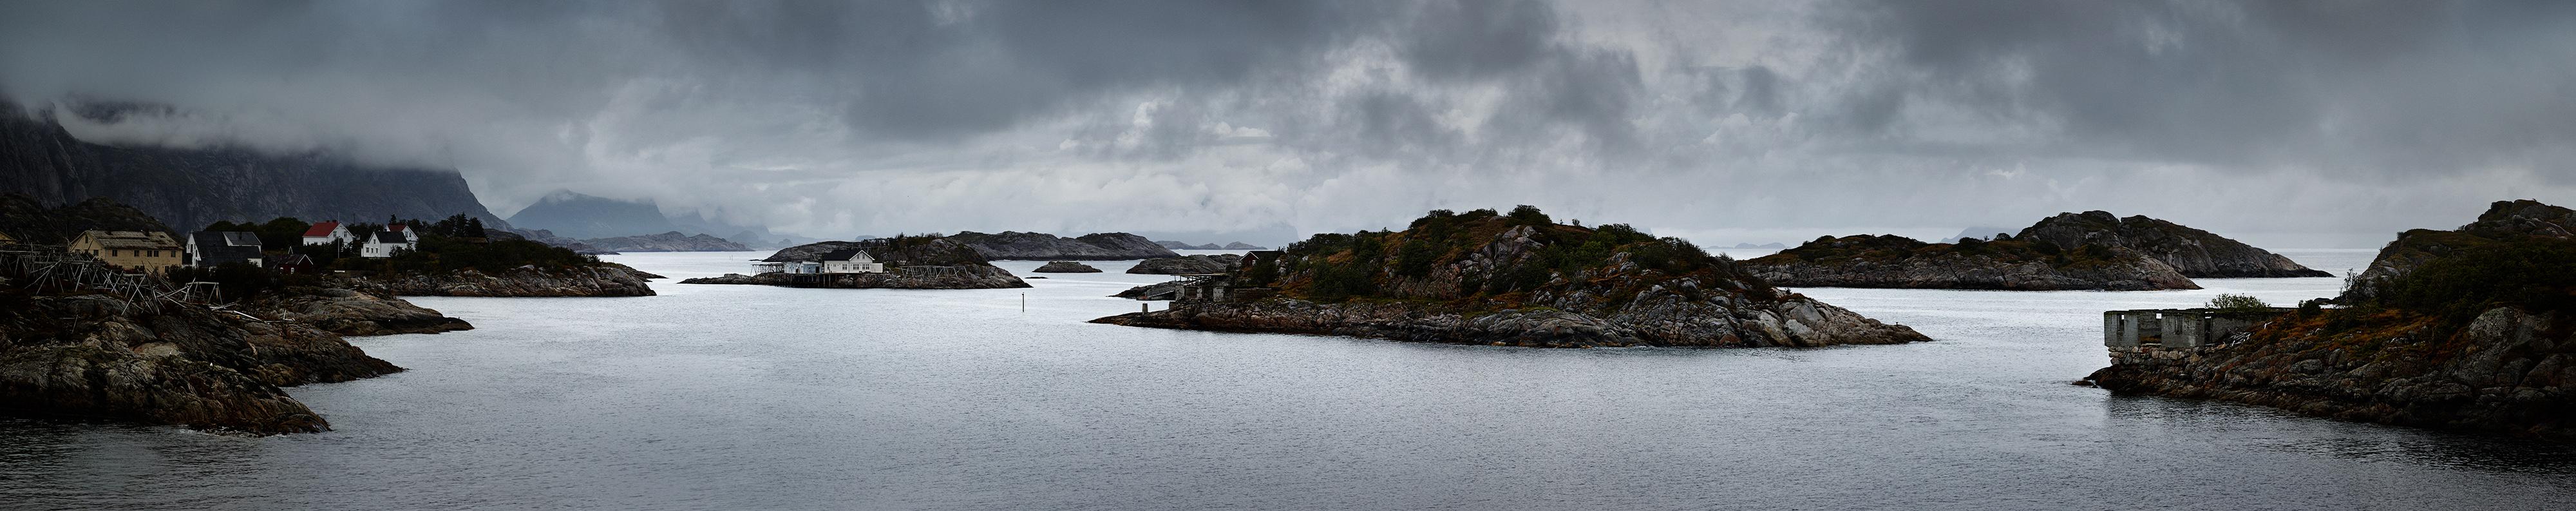 Henningsvaer Lofoten Noorwegen